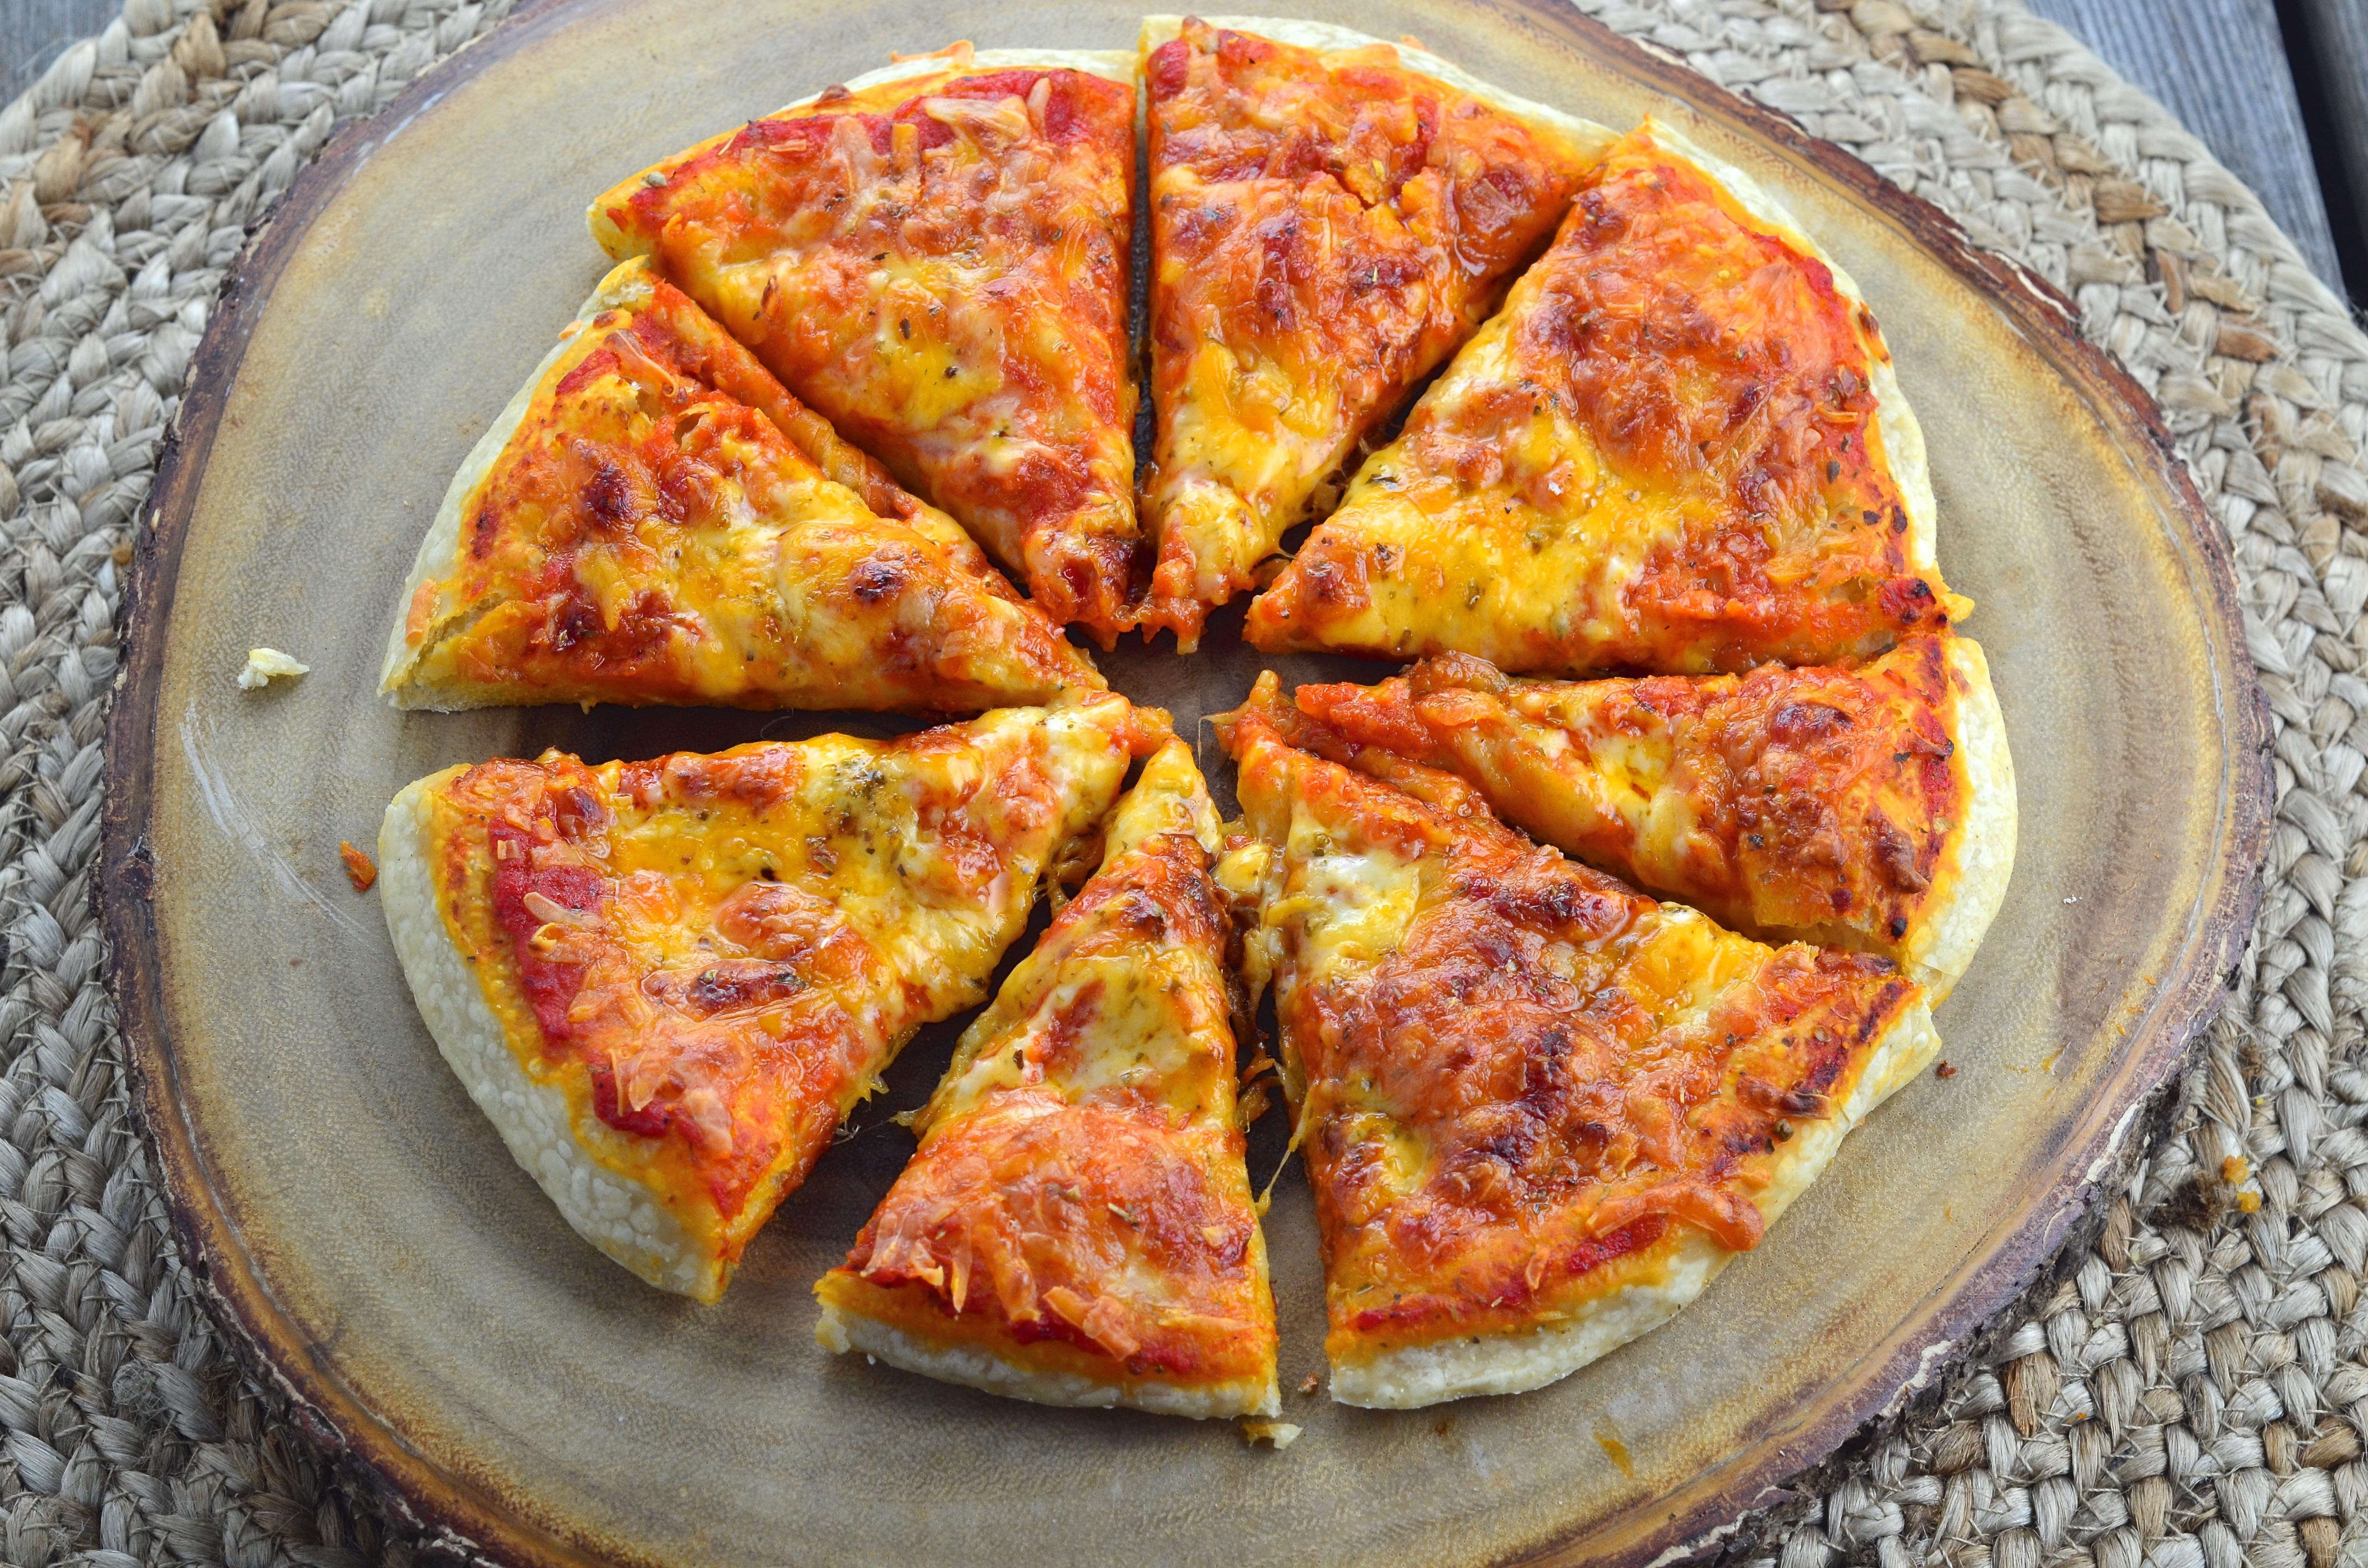 Easy Peezy Pizza Dough (Bread Machine Pizza Dough)